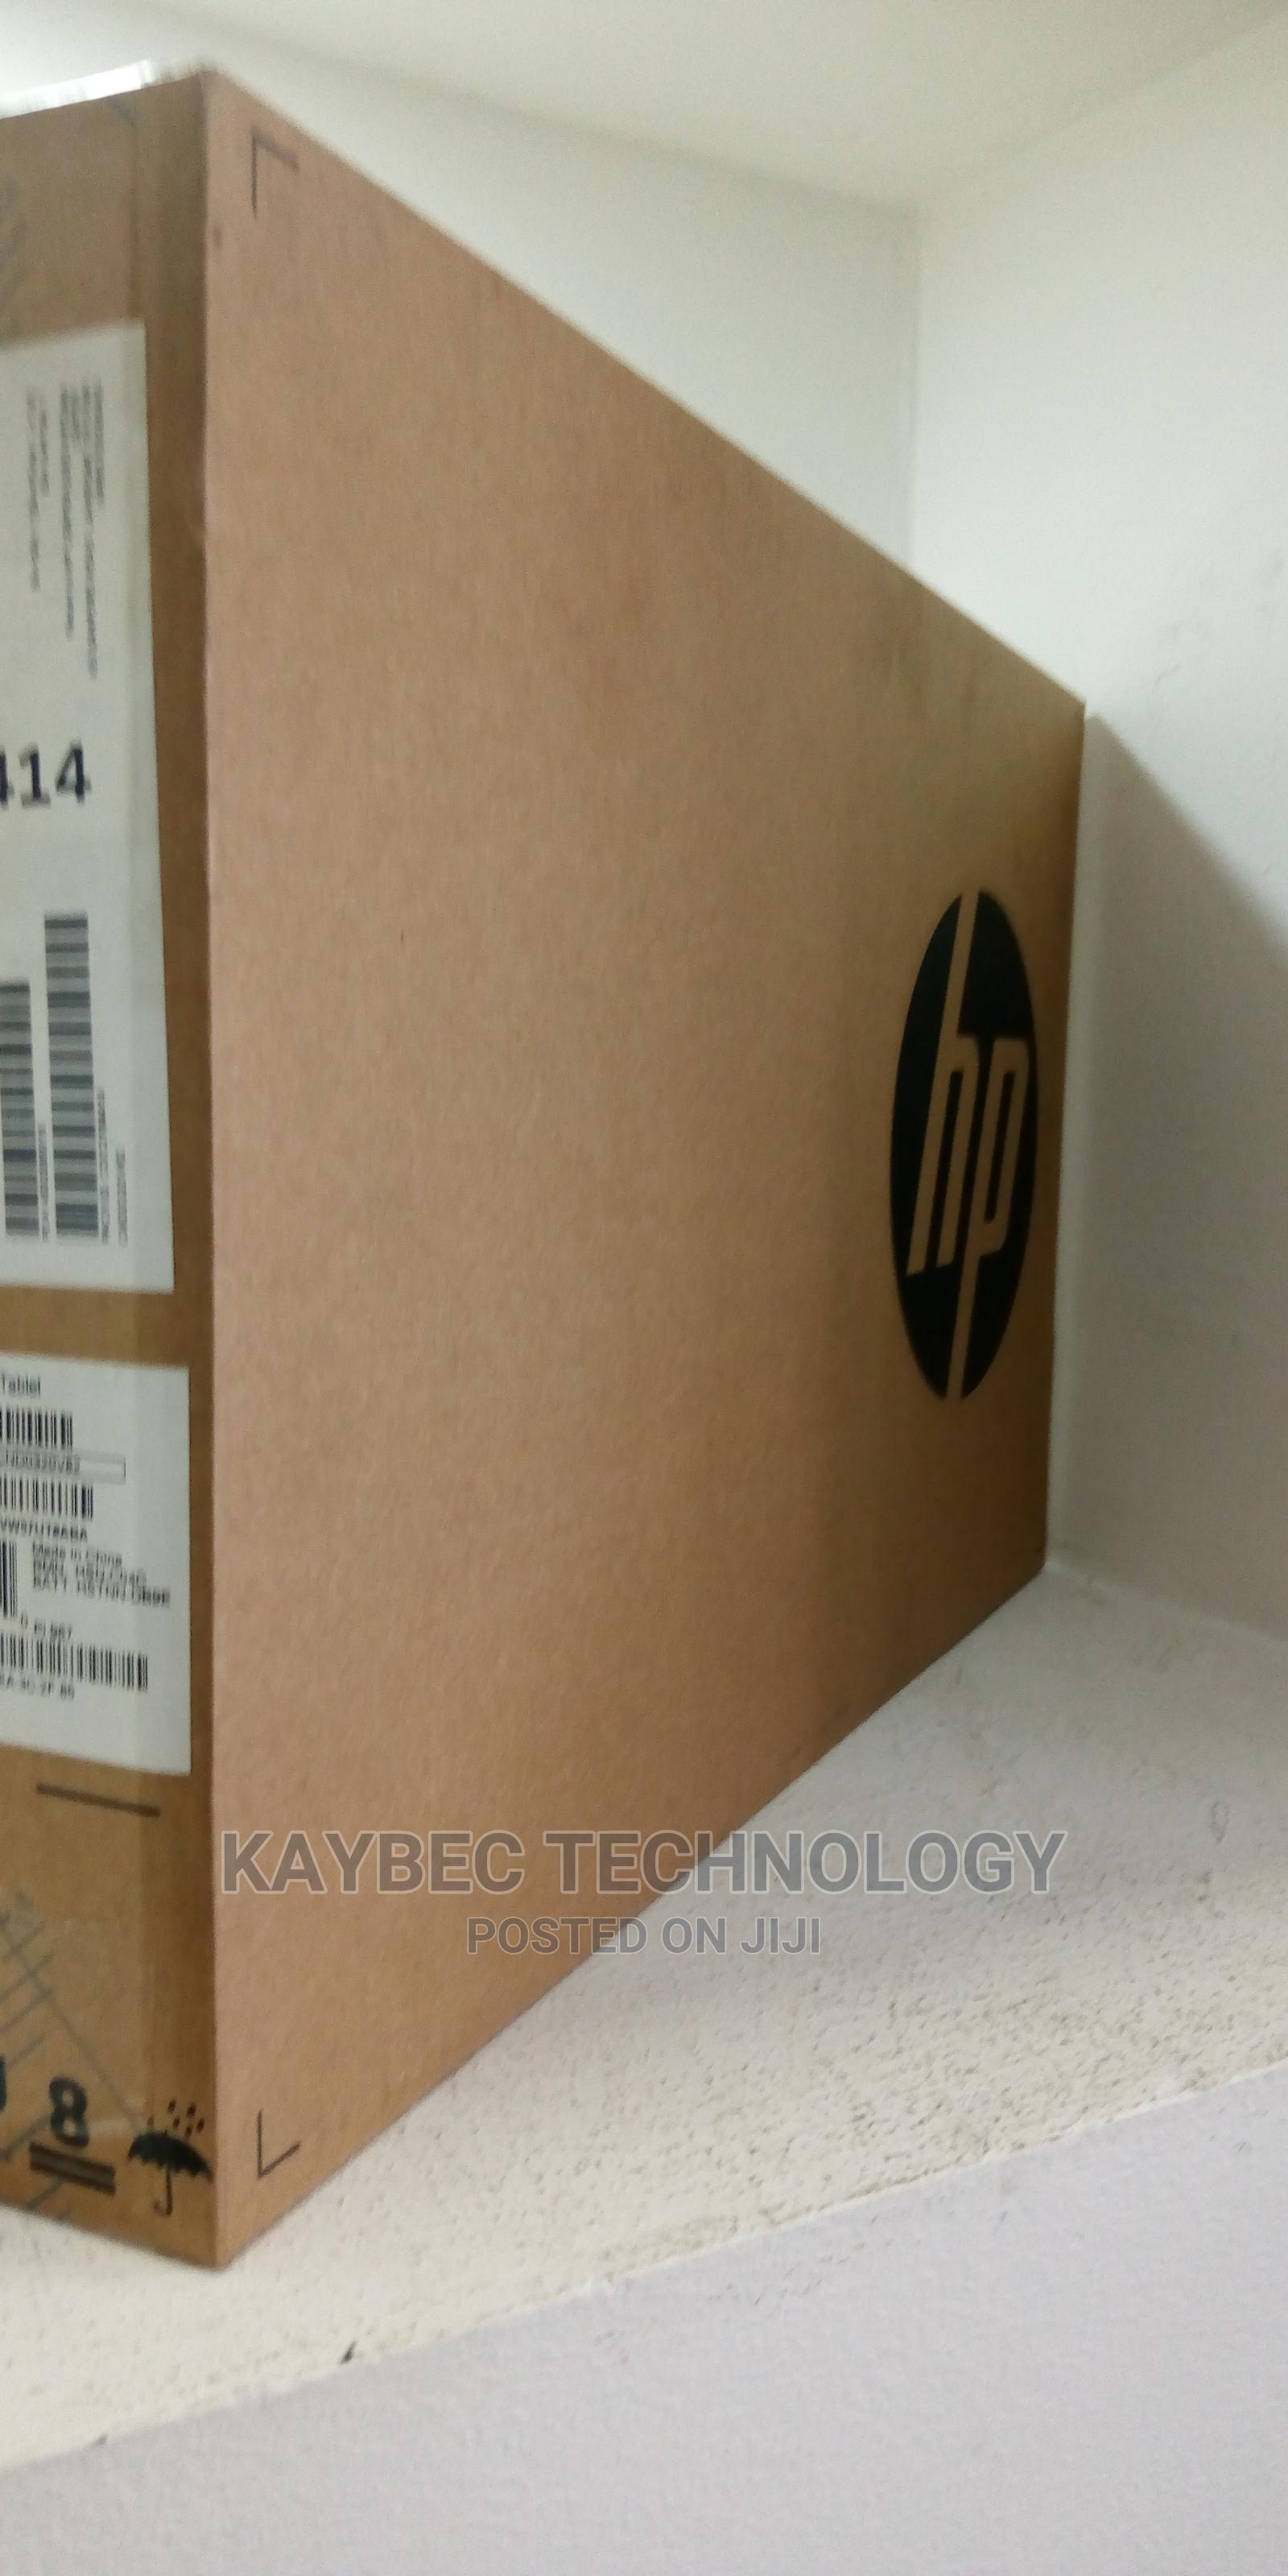 New Laptop HP Elite X2 1012 16GB Intel Core I7 SSD 512GB | Laptops & Computers for sale in Ikeja, Lagos State, Nigeria